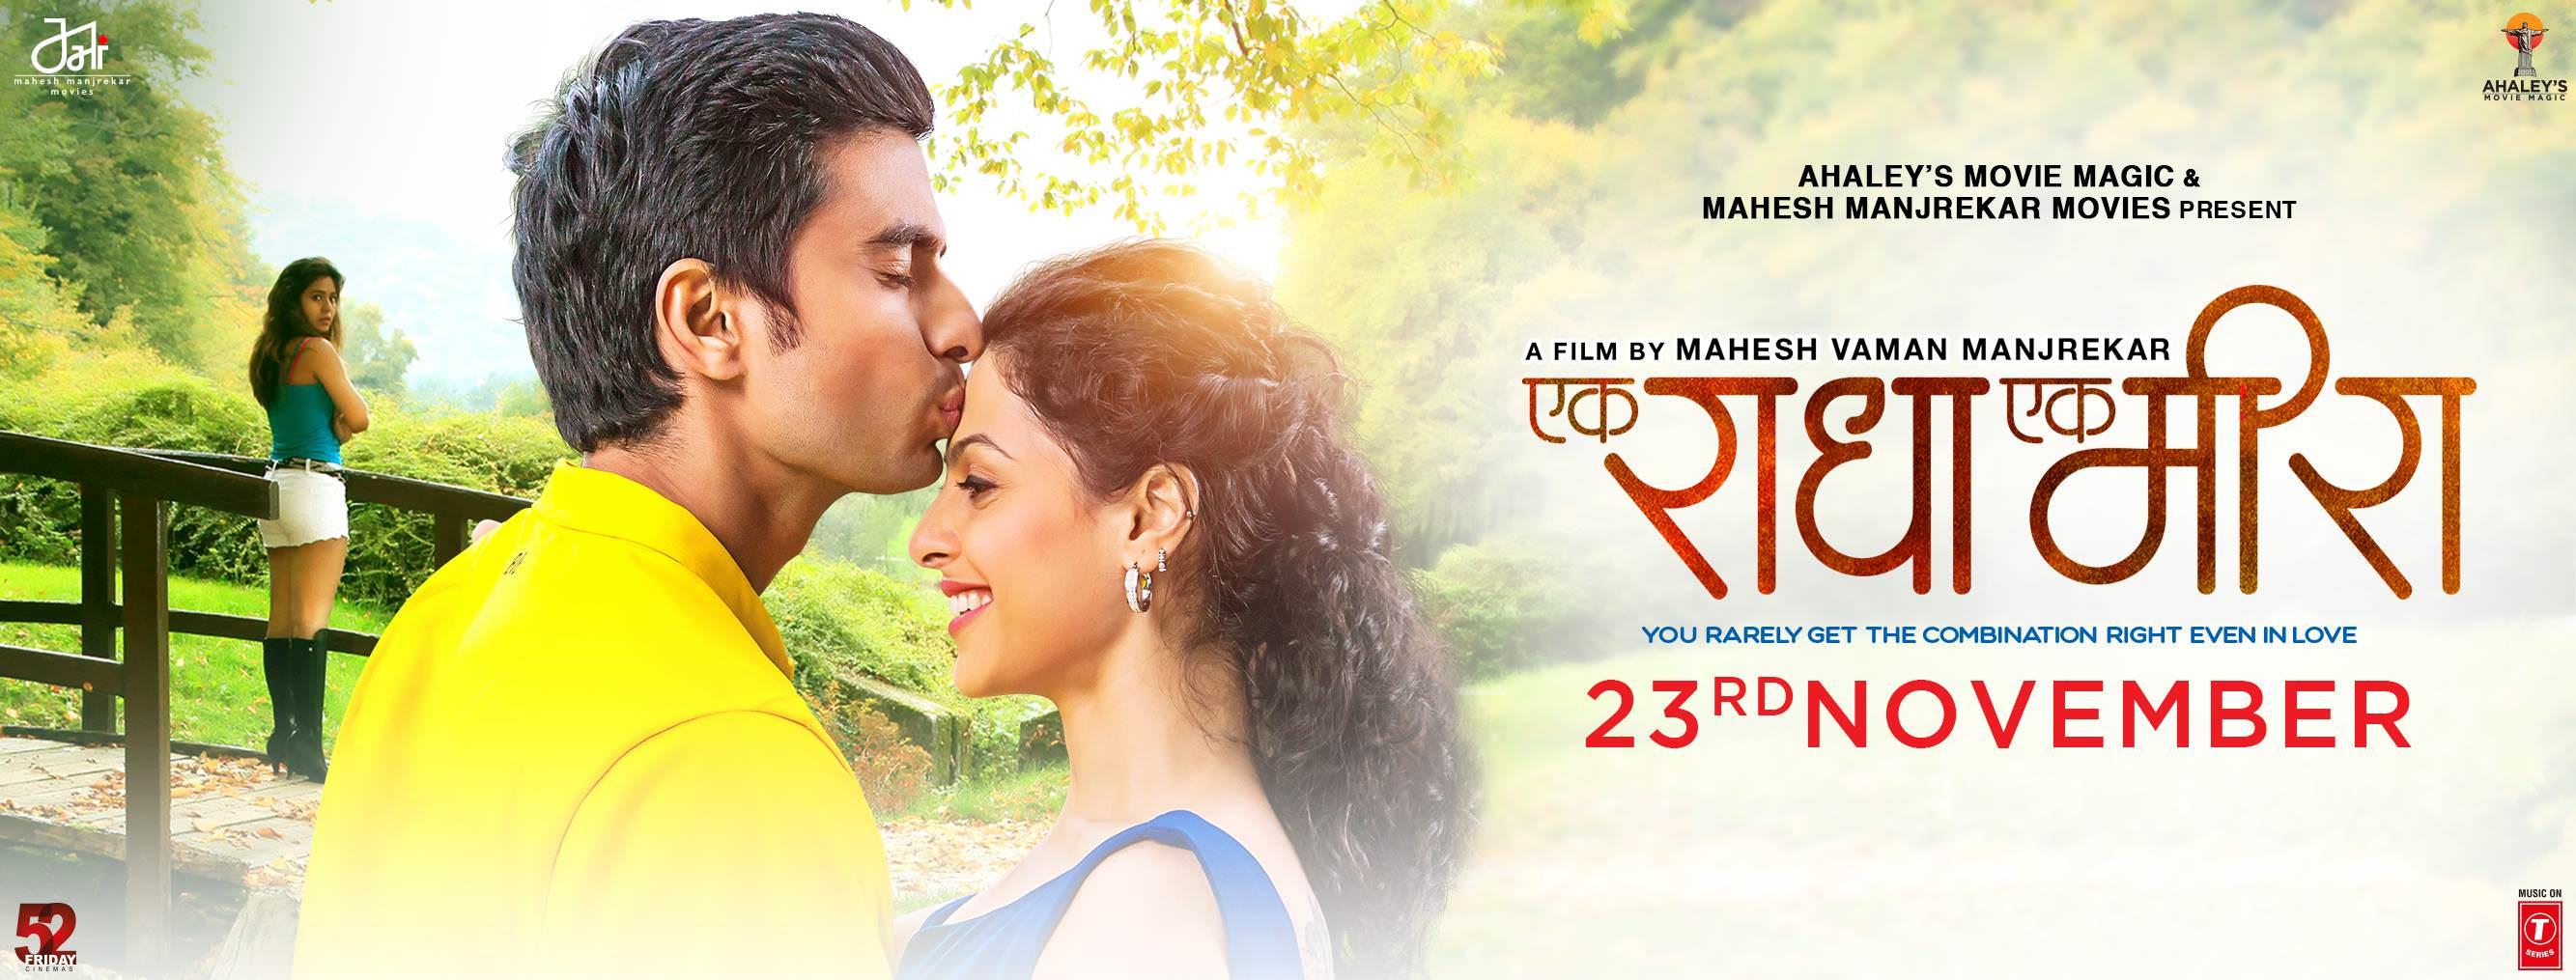 Marathi movies 2018 full movie download sites | Malicious